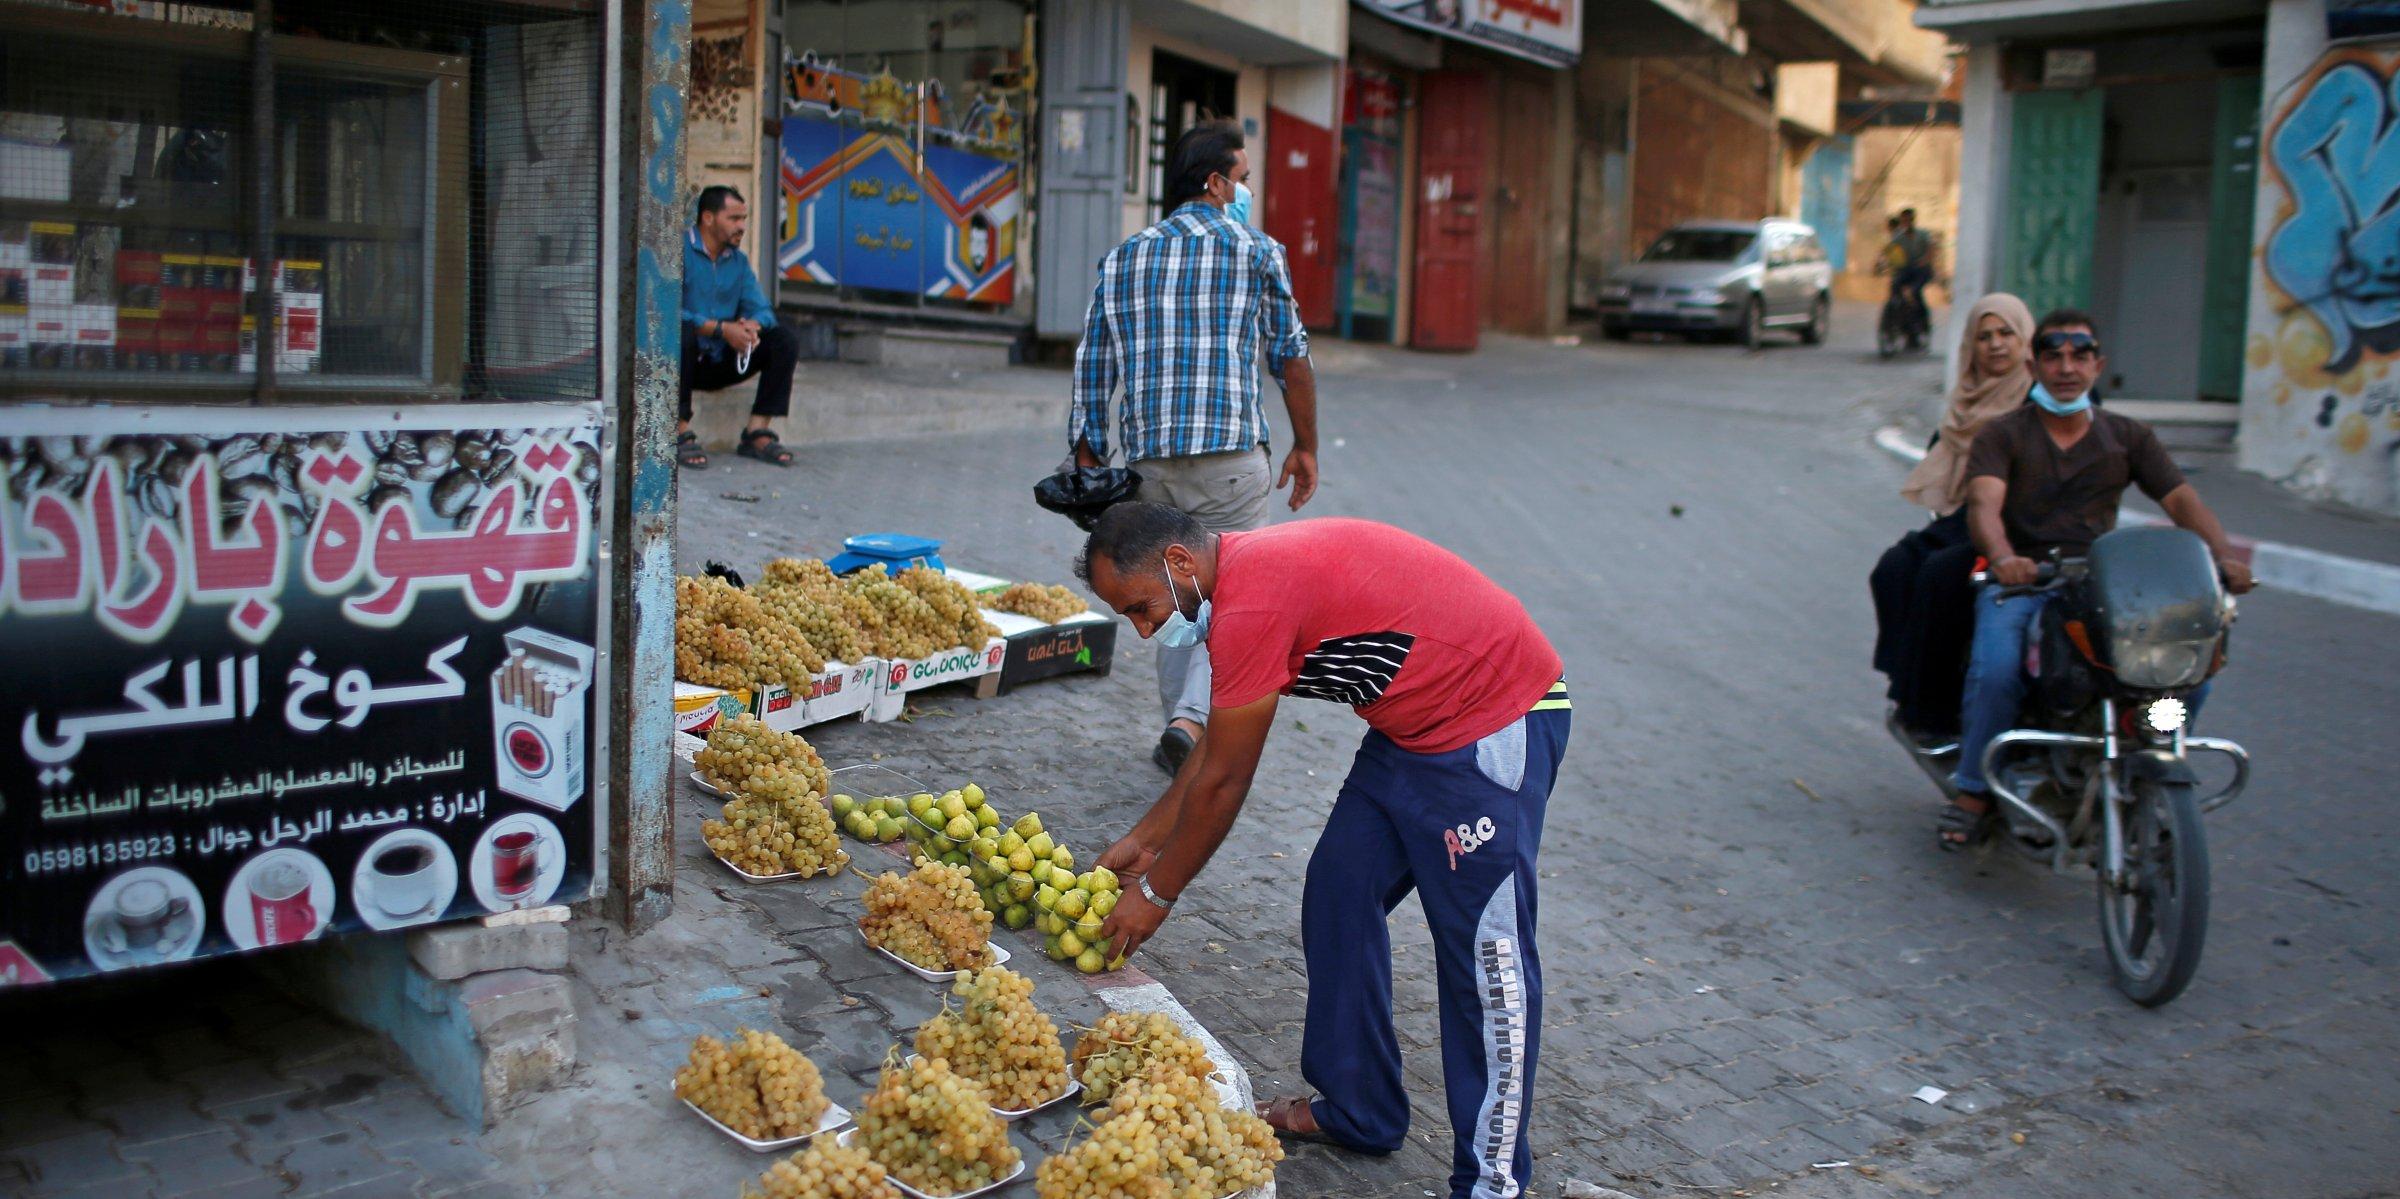 Image of article 'Gaza families start receiving Qatari financial aid'